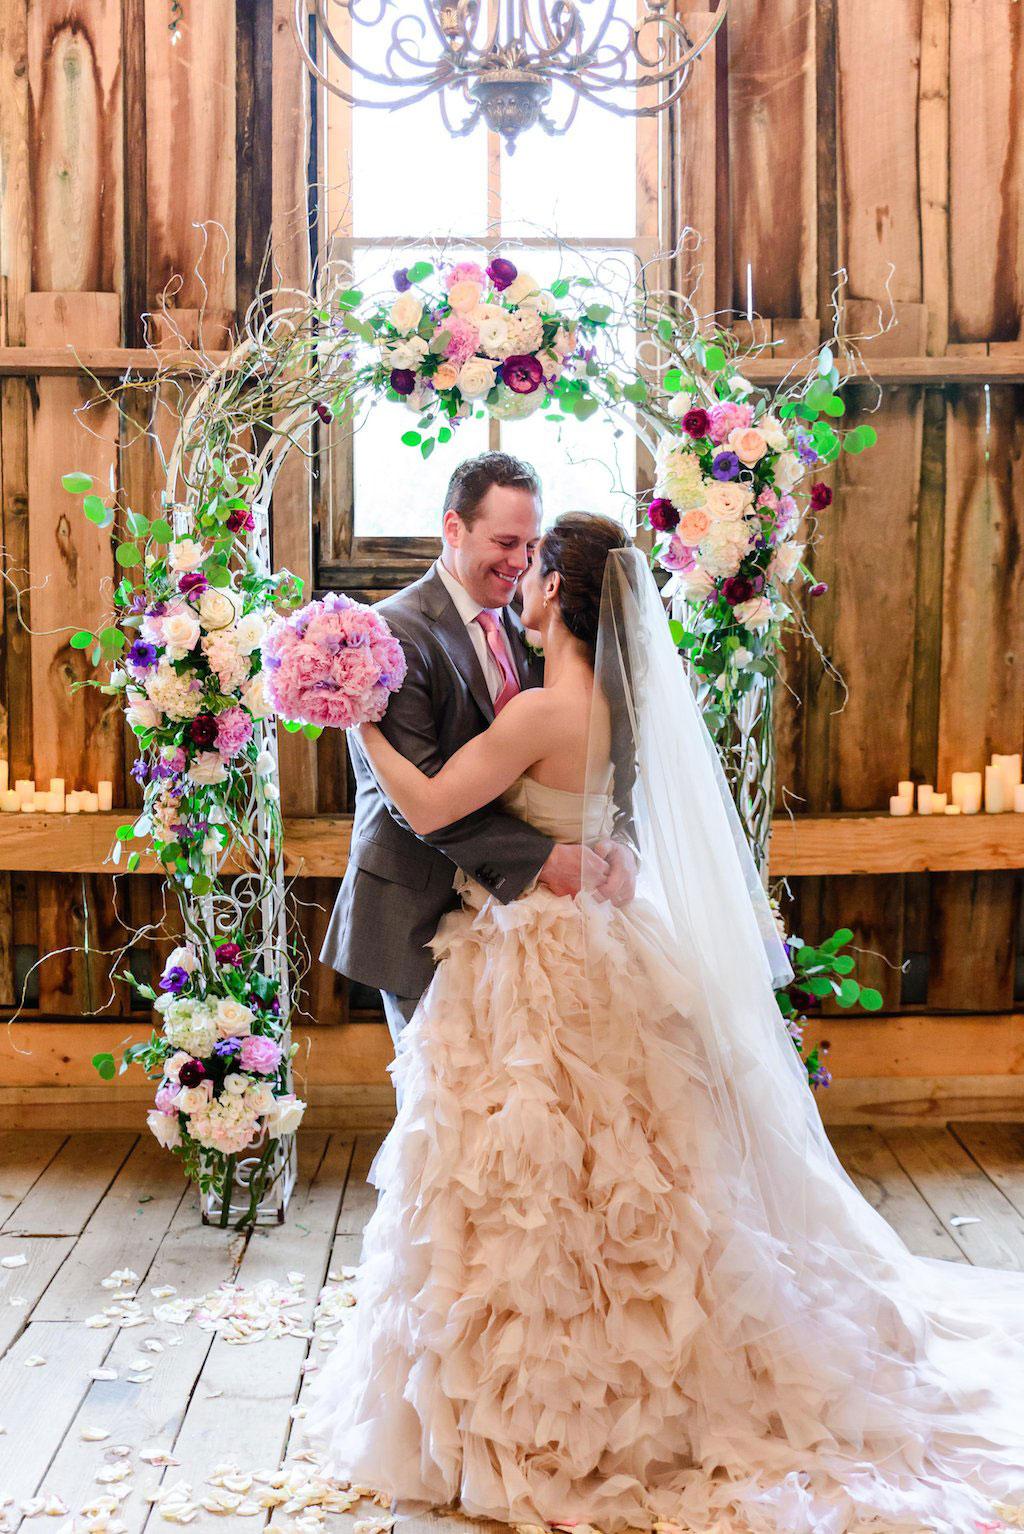 7-11-16-fairy-tale-barn-wedding-pink-blush-8